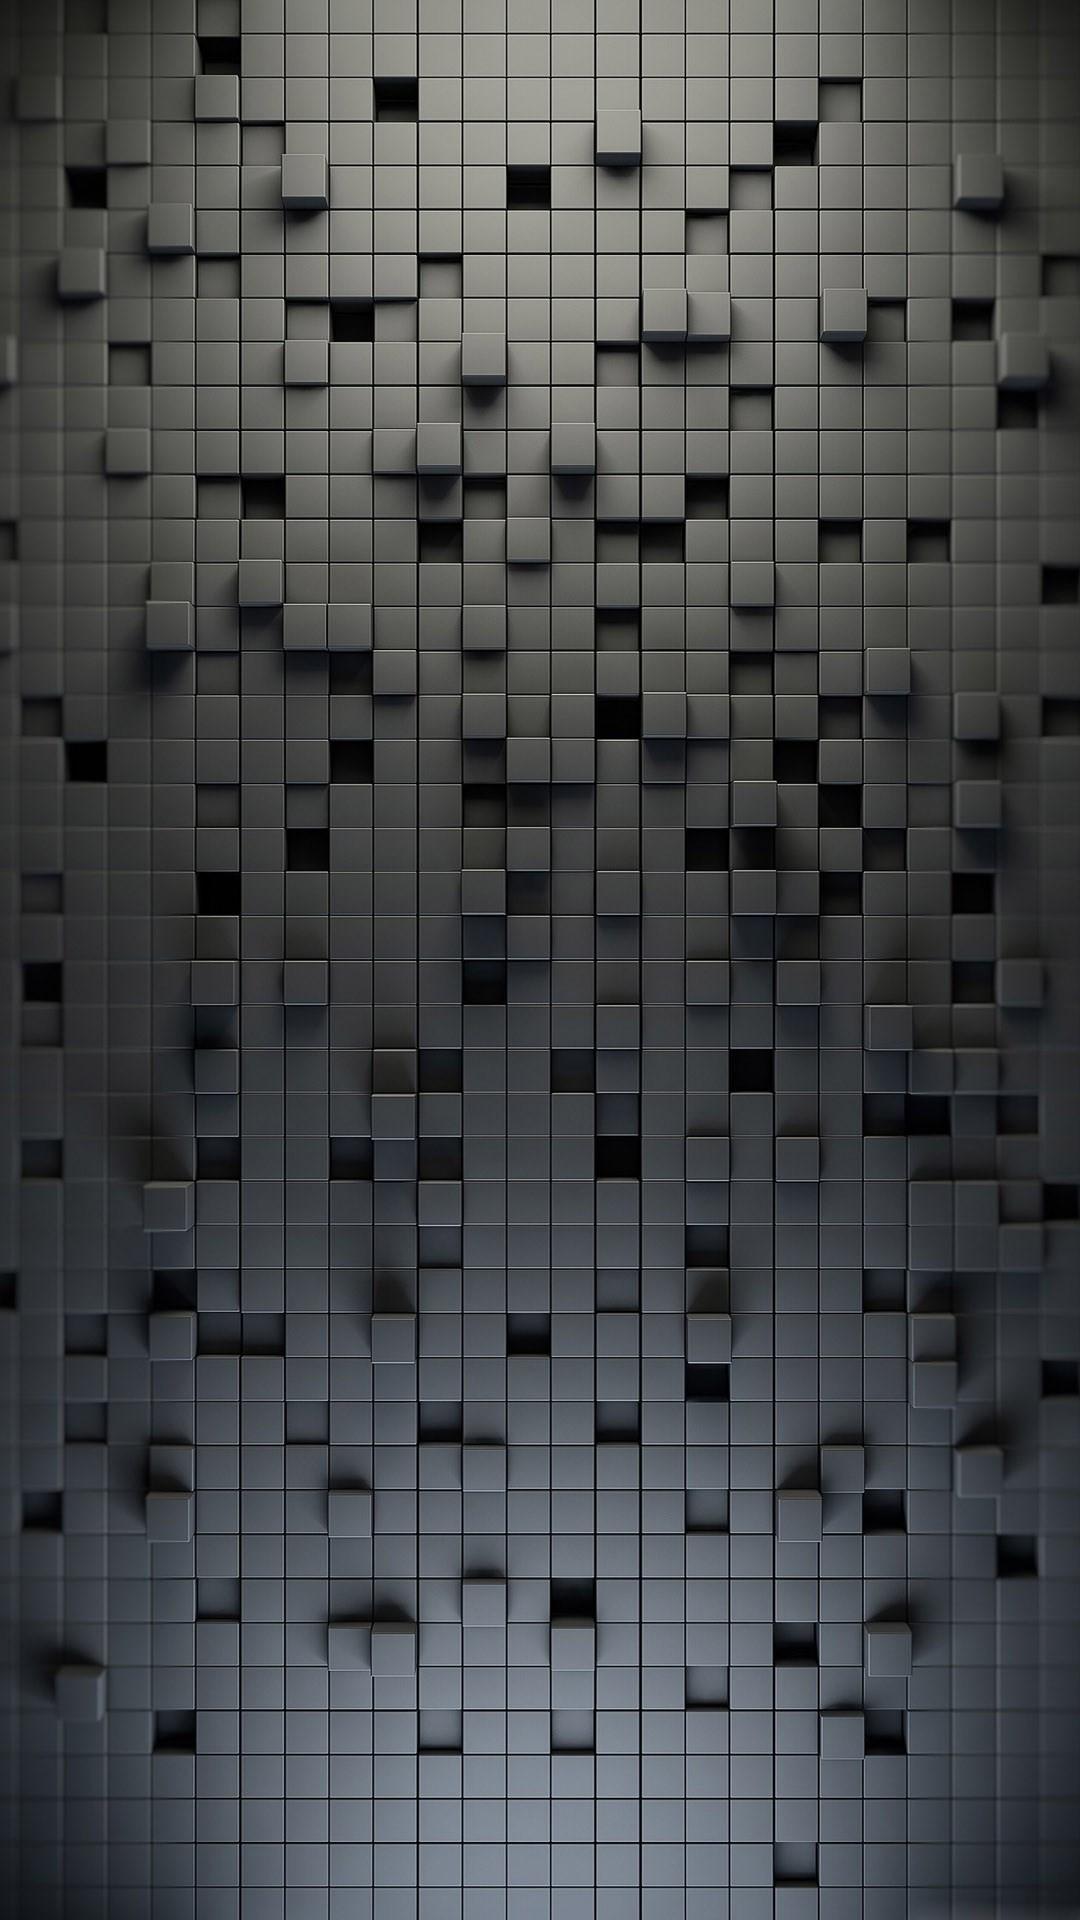 1080 x 1920 wallpaper hd free download